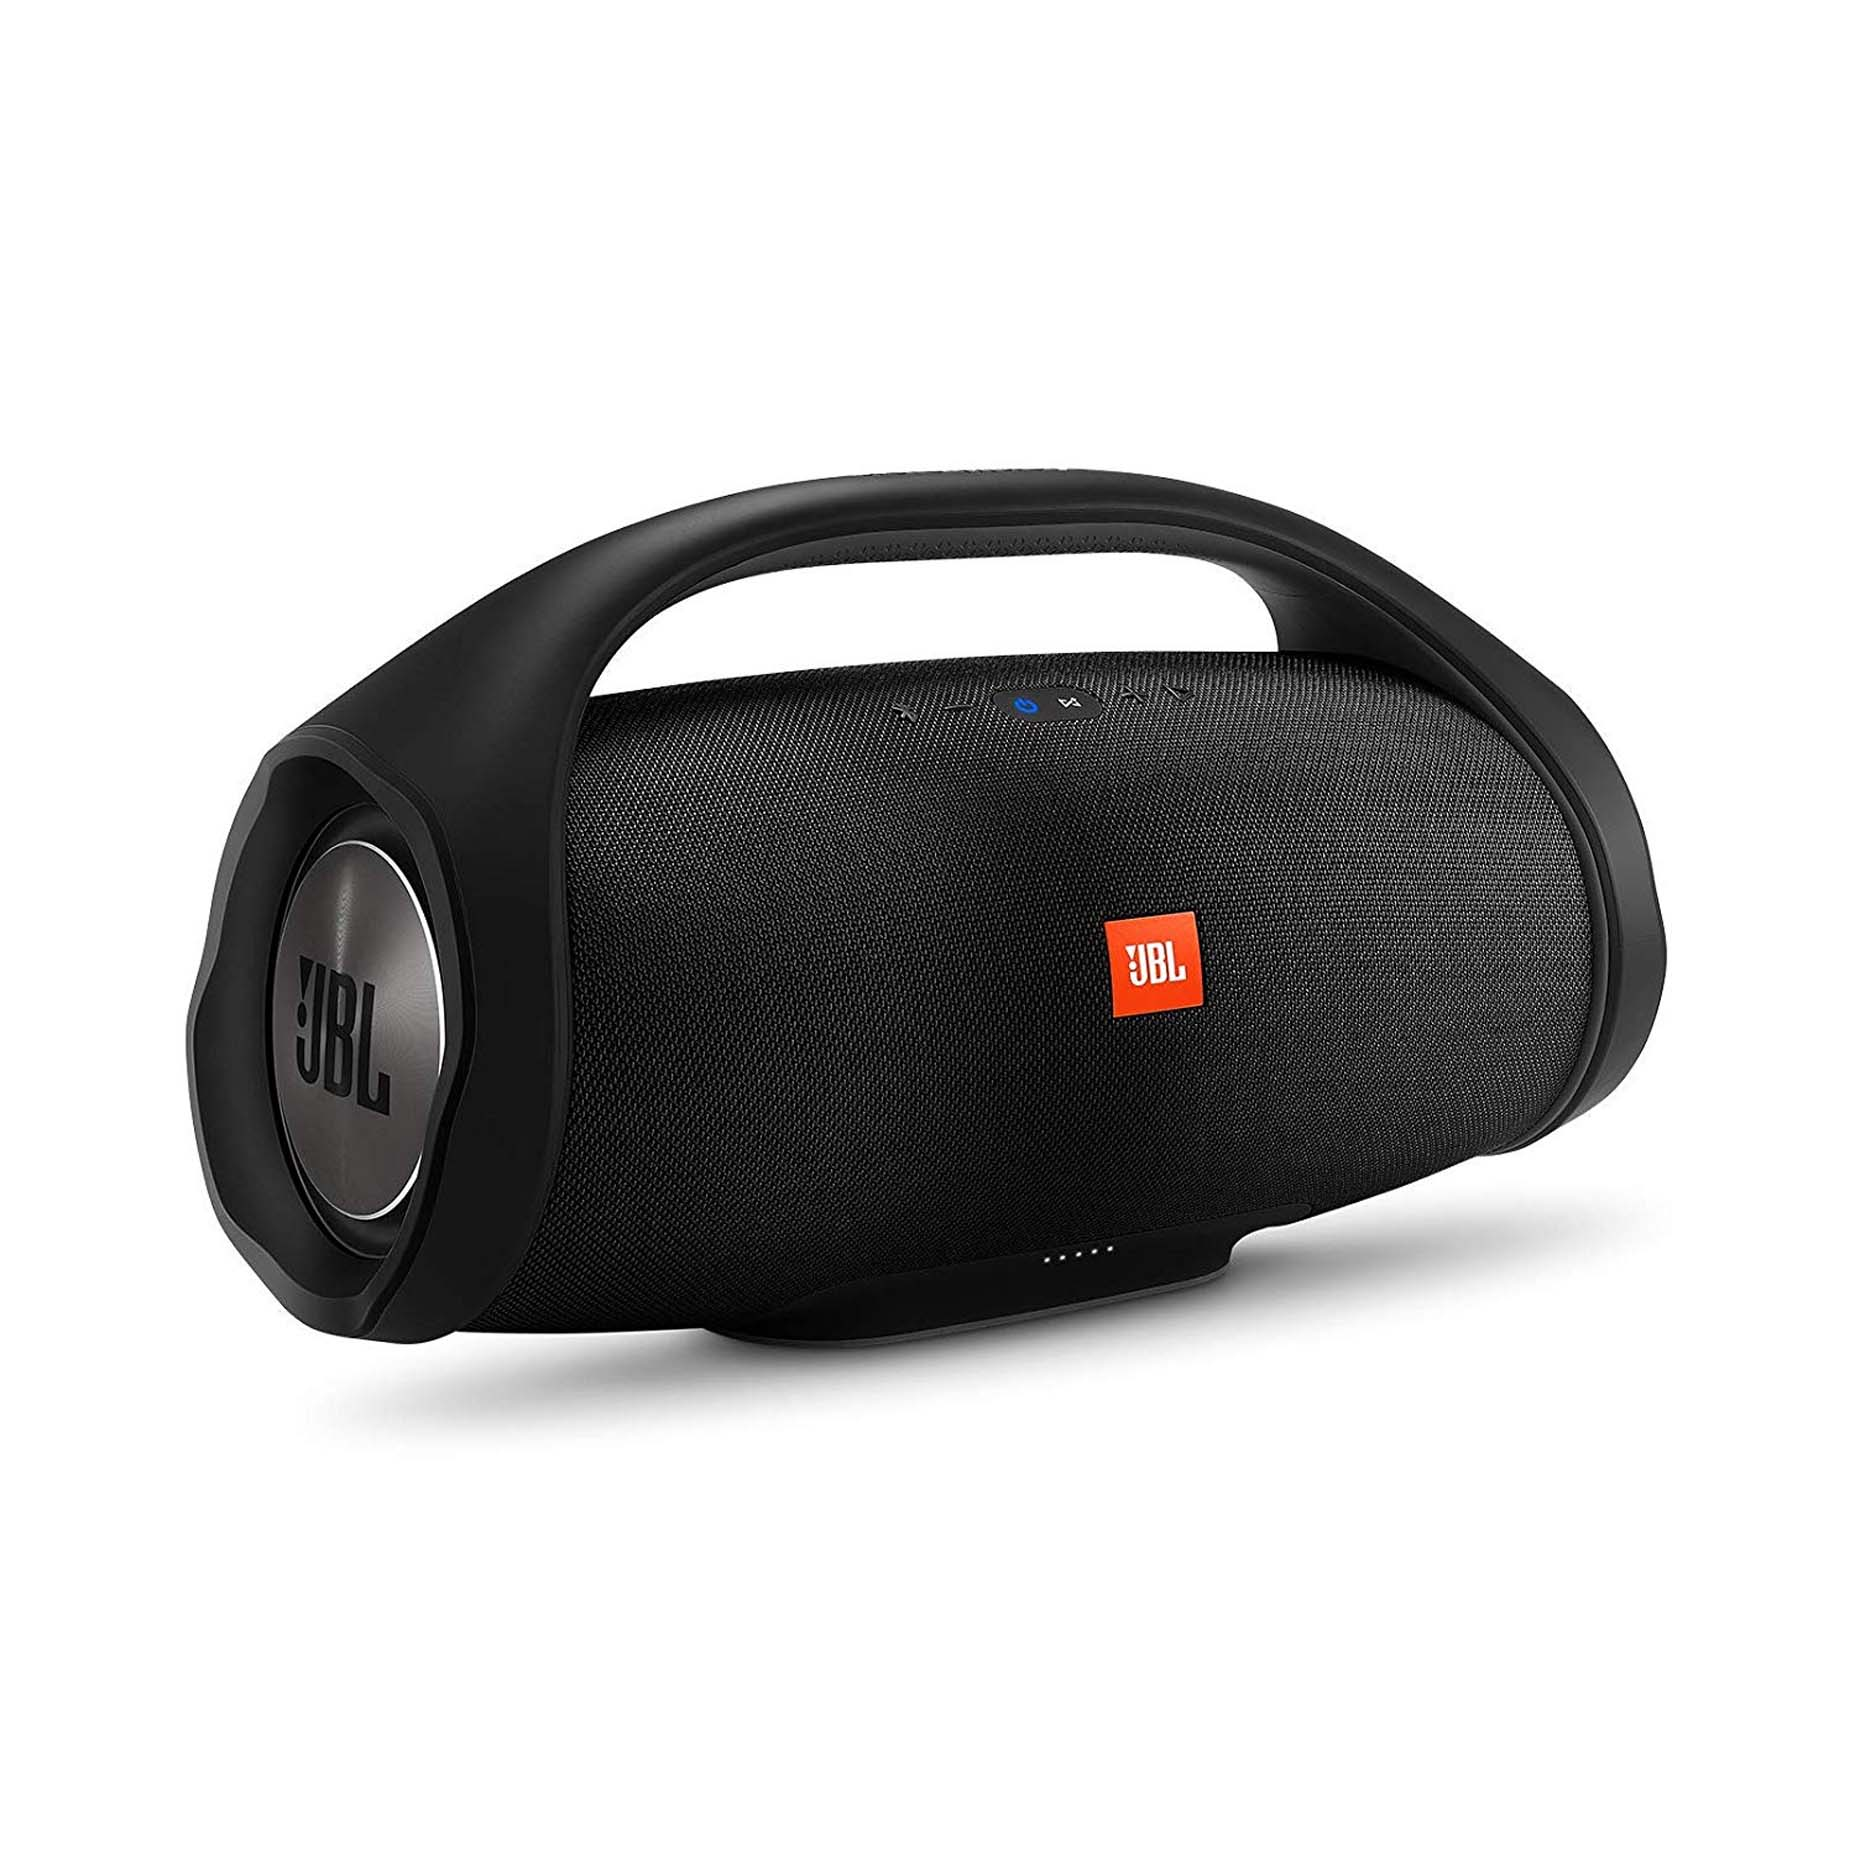 Harga JBL Boombox Portable Bluetooth Speaker